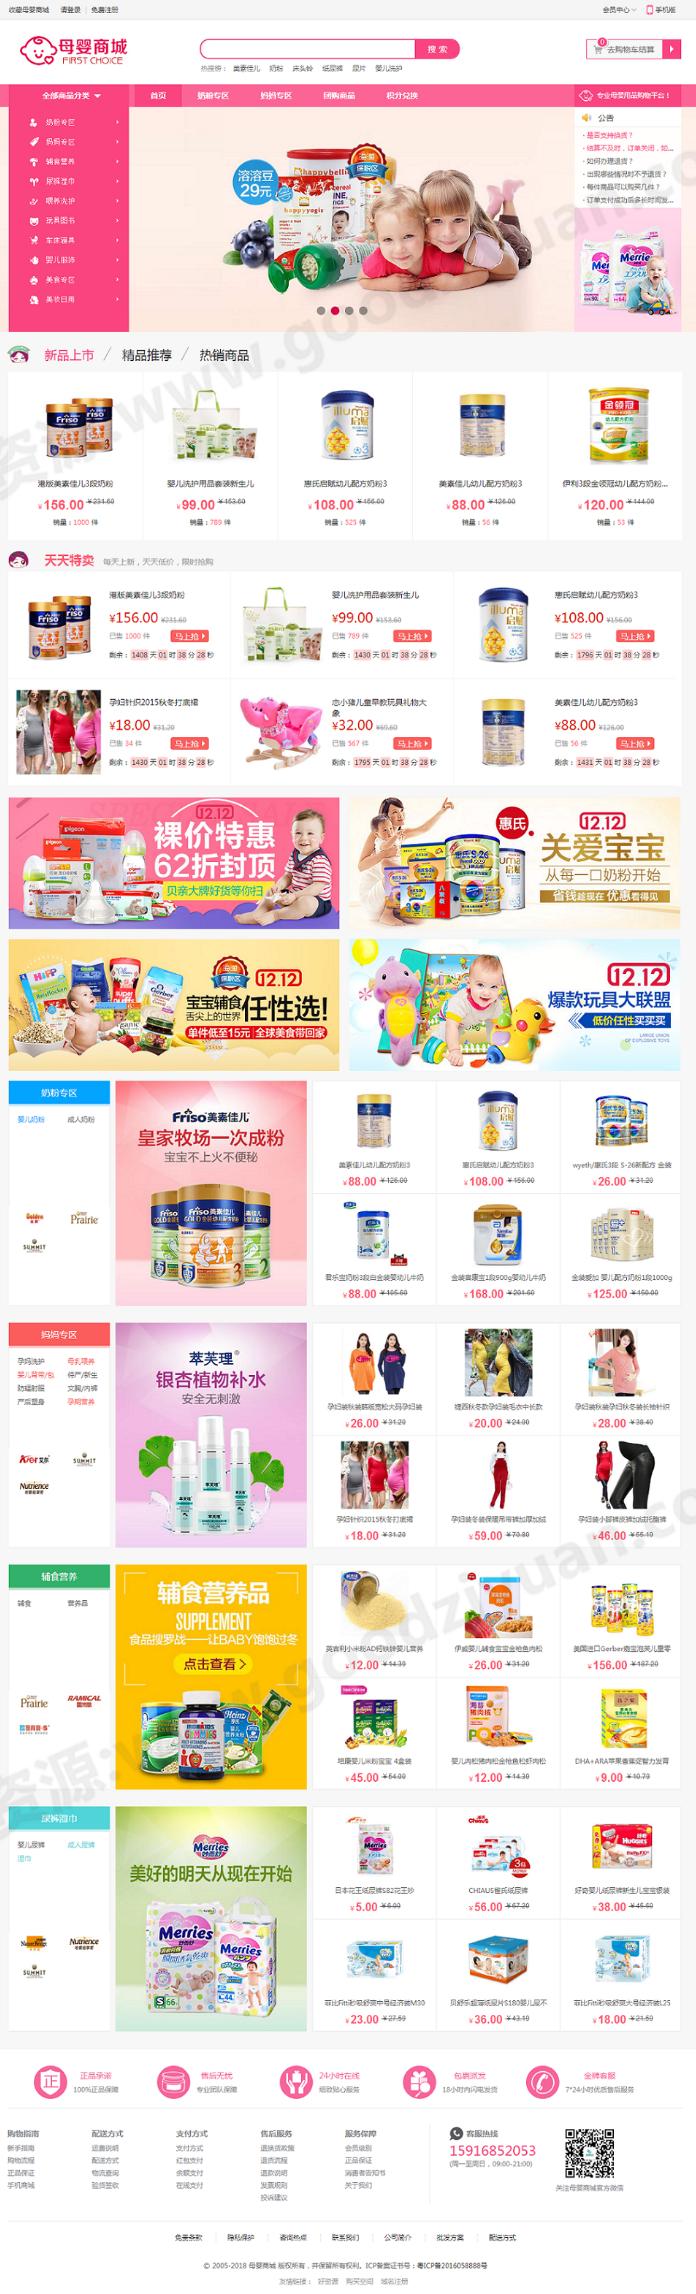 ECshop母婴用品商城新版系统(微商城+微分销+微信支付)